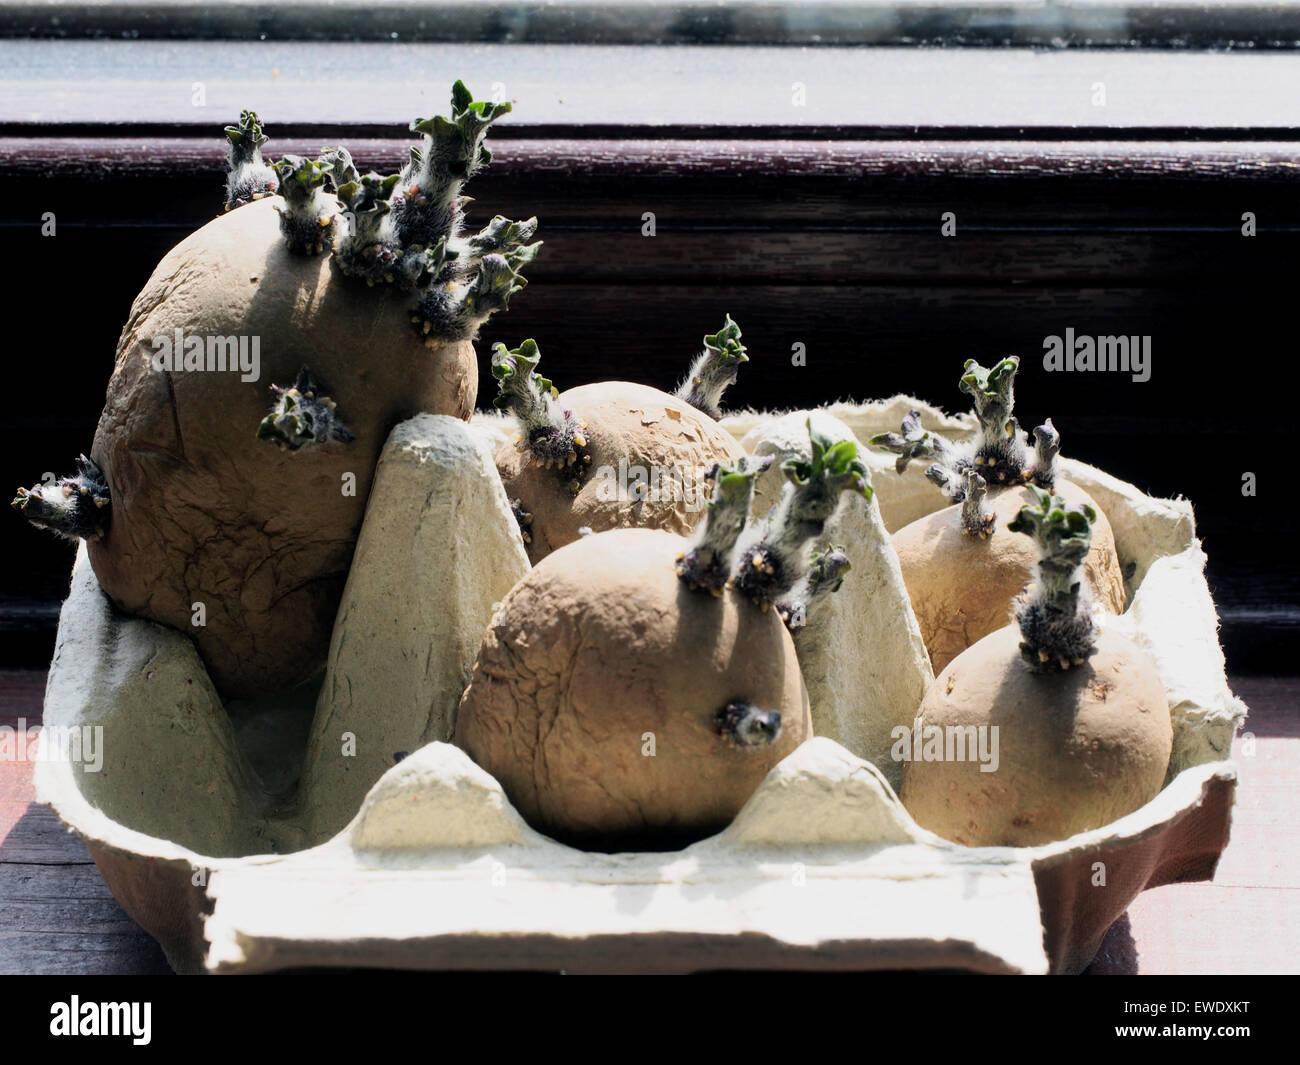 Chitting seed potatoes in windowsill egg box - Stock Image